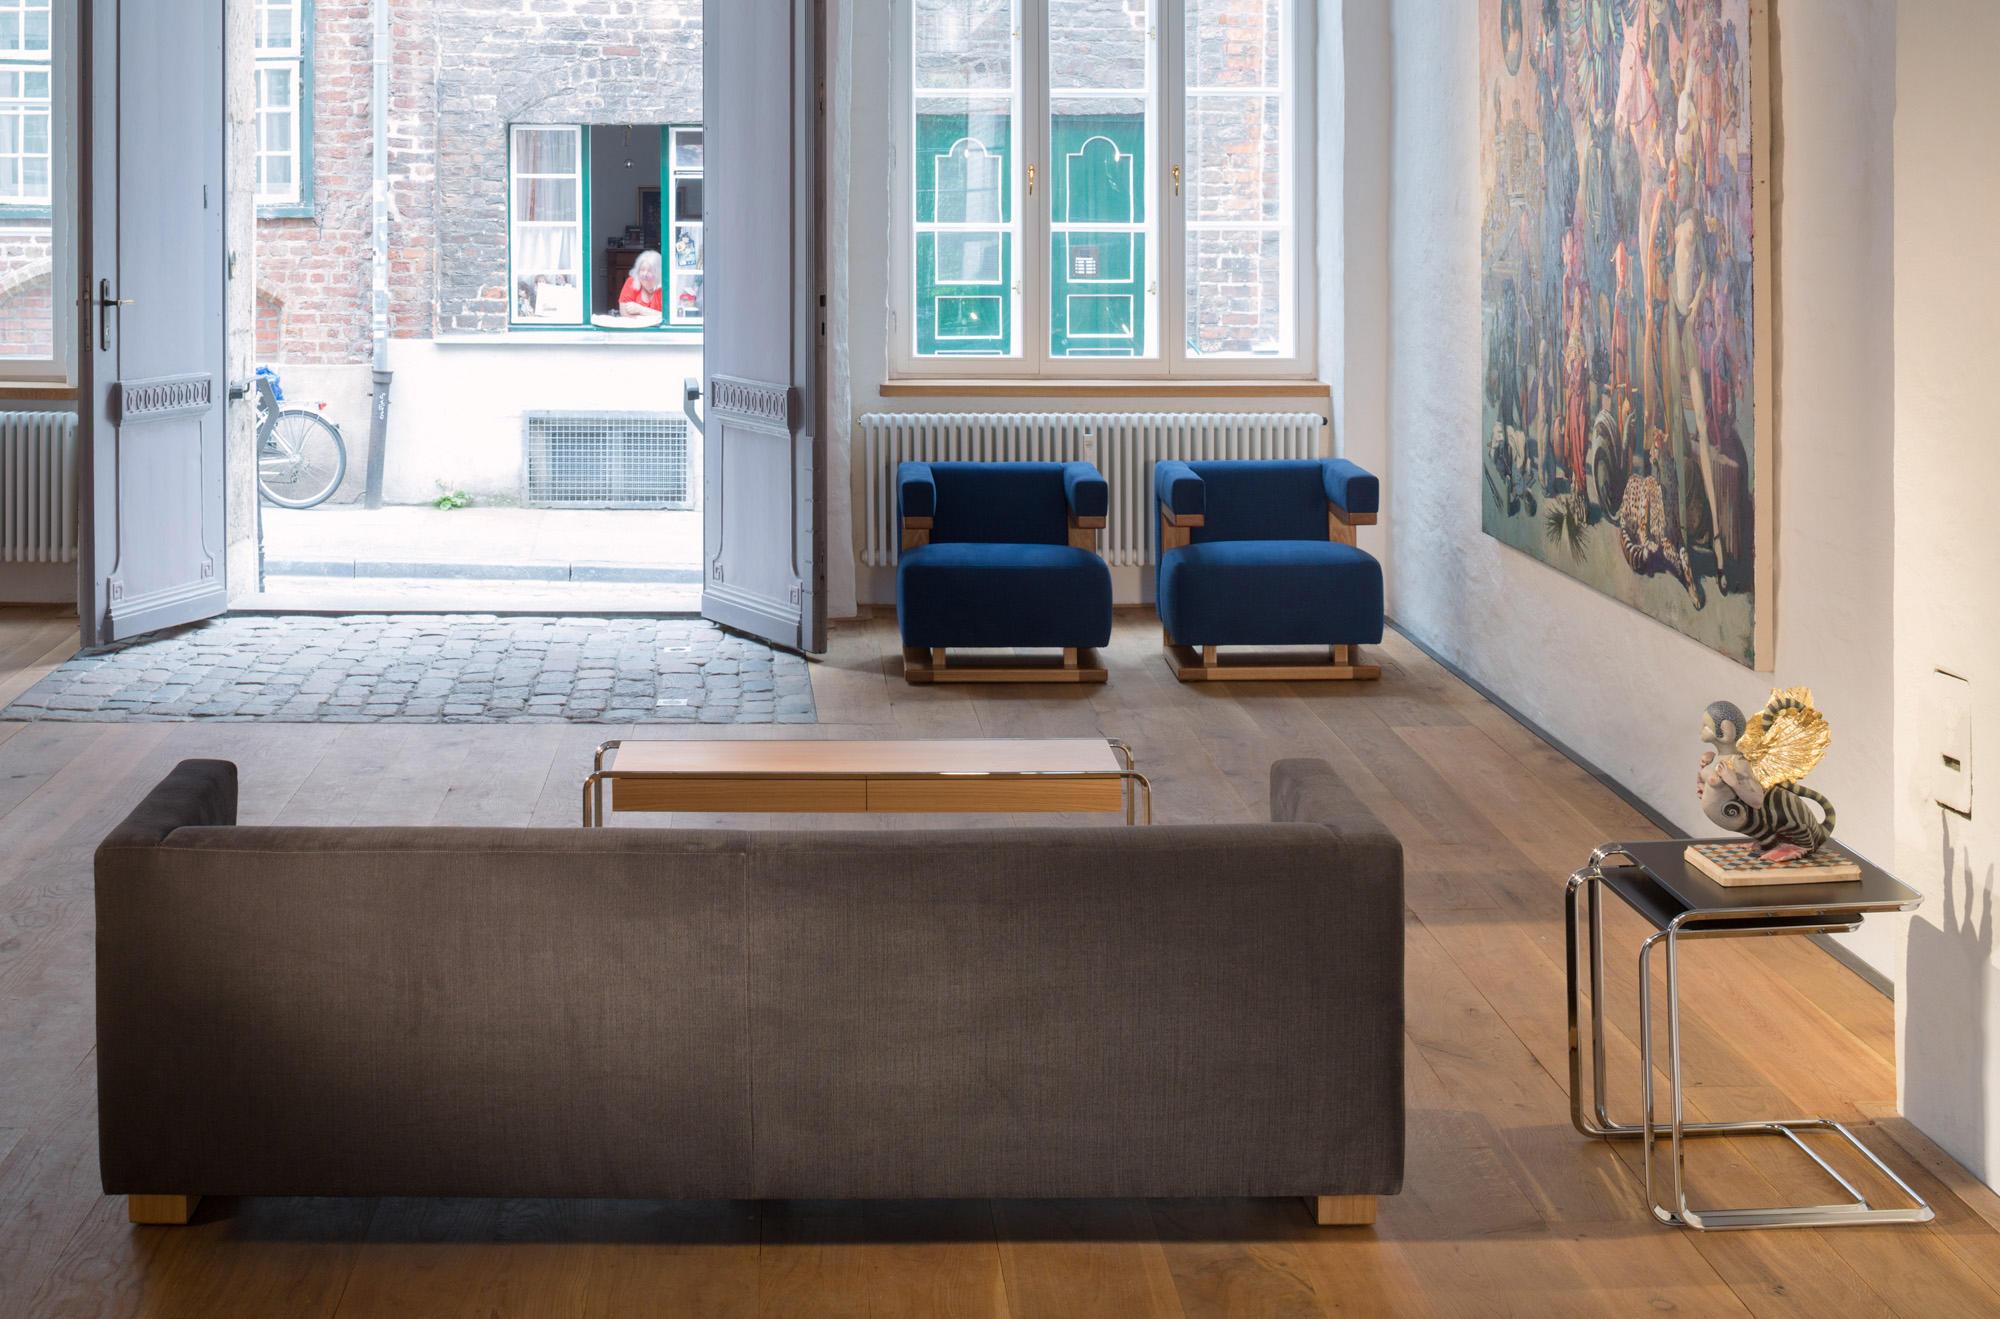 f51 gropius armchair sillones de tecta architonic. Black Bedroom Furniture Sets. Home Design Ideas